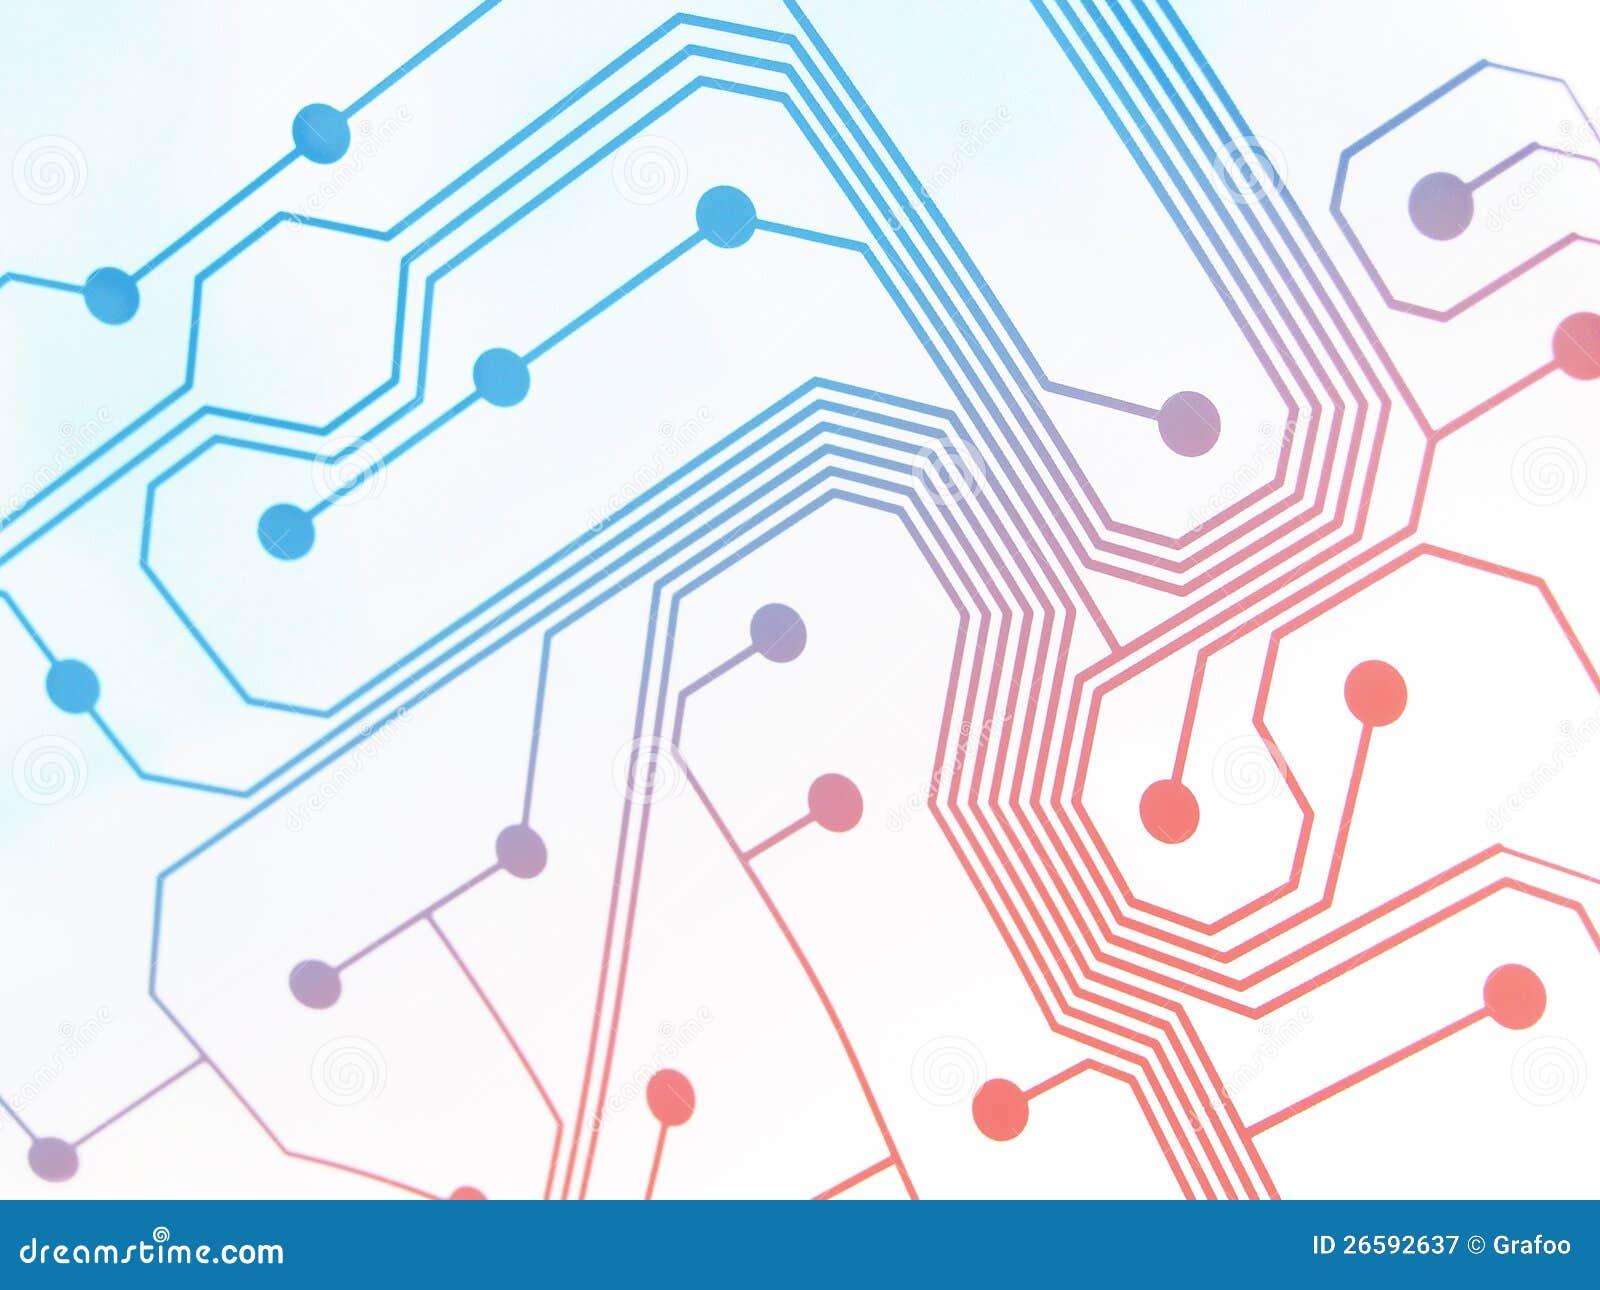 Placa de circuito electrónica